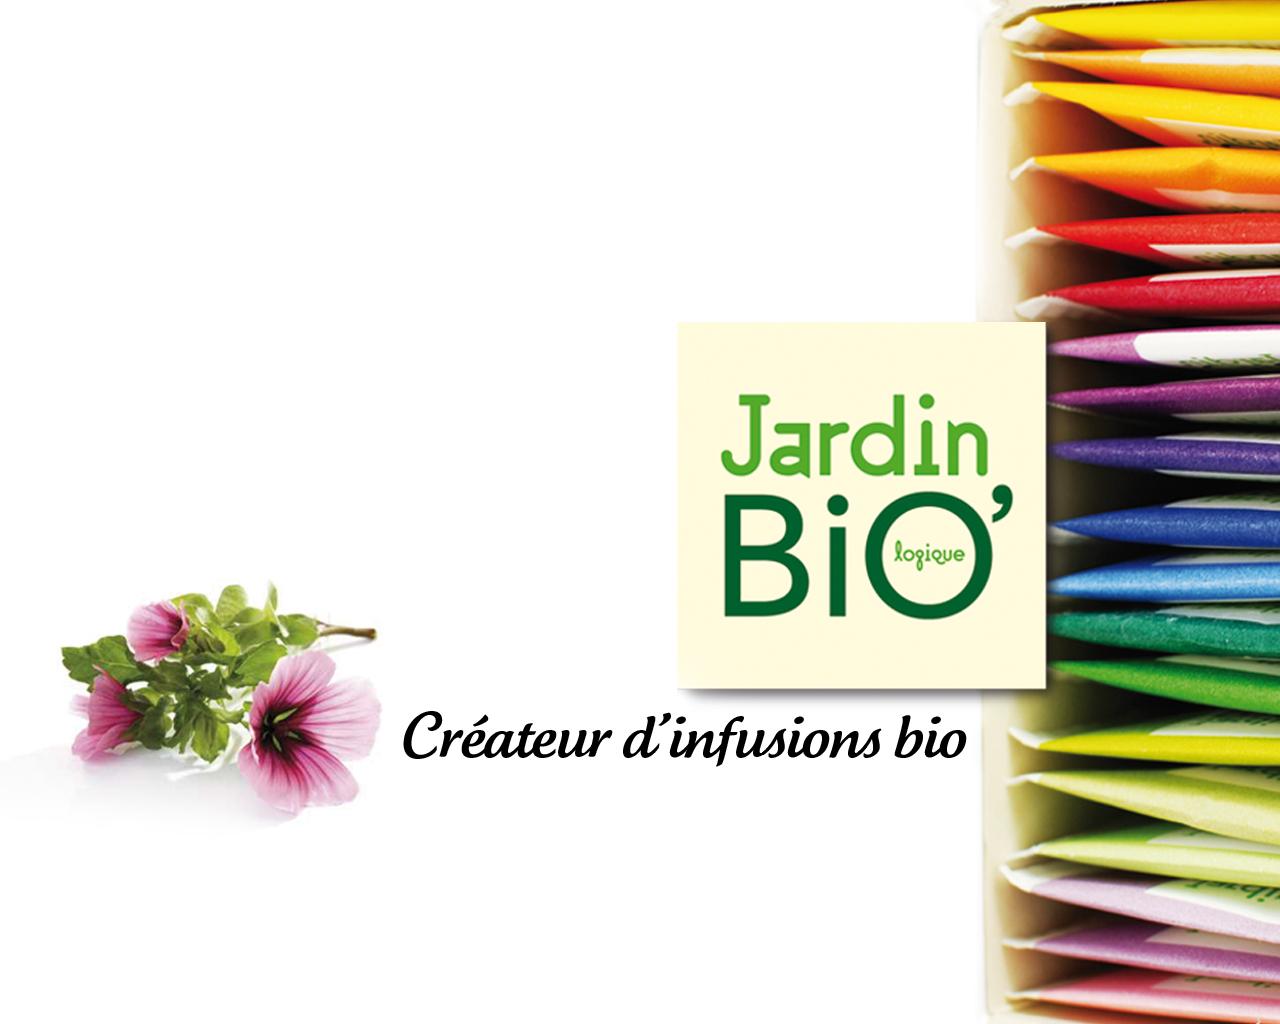 Wallpaper jardin bio 1280 2 wallpaper jardin bio 39 1280 2 for Jardin bio